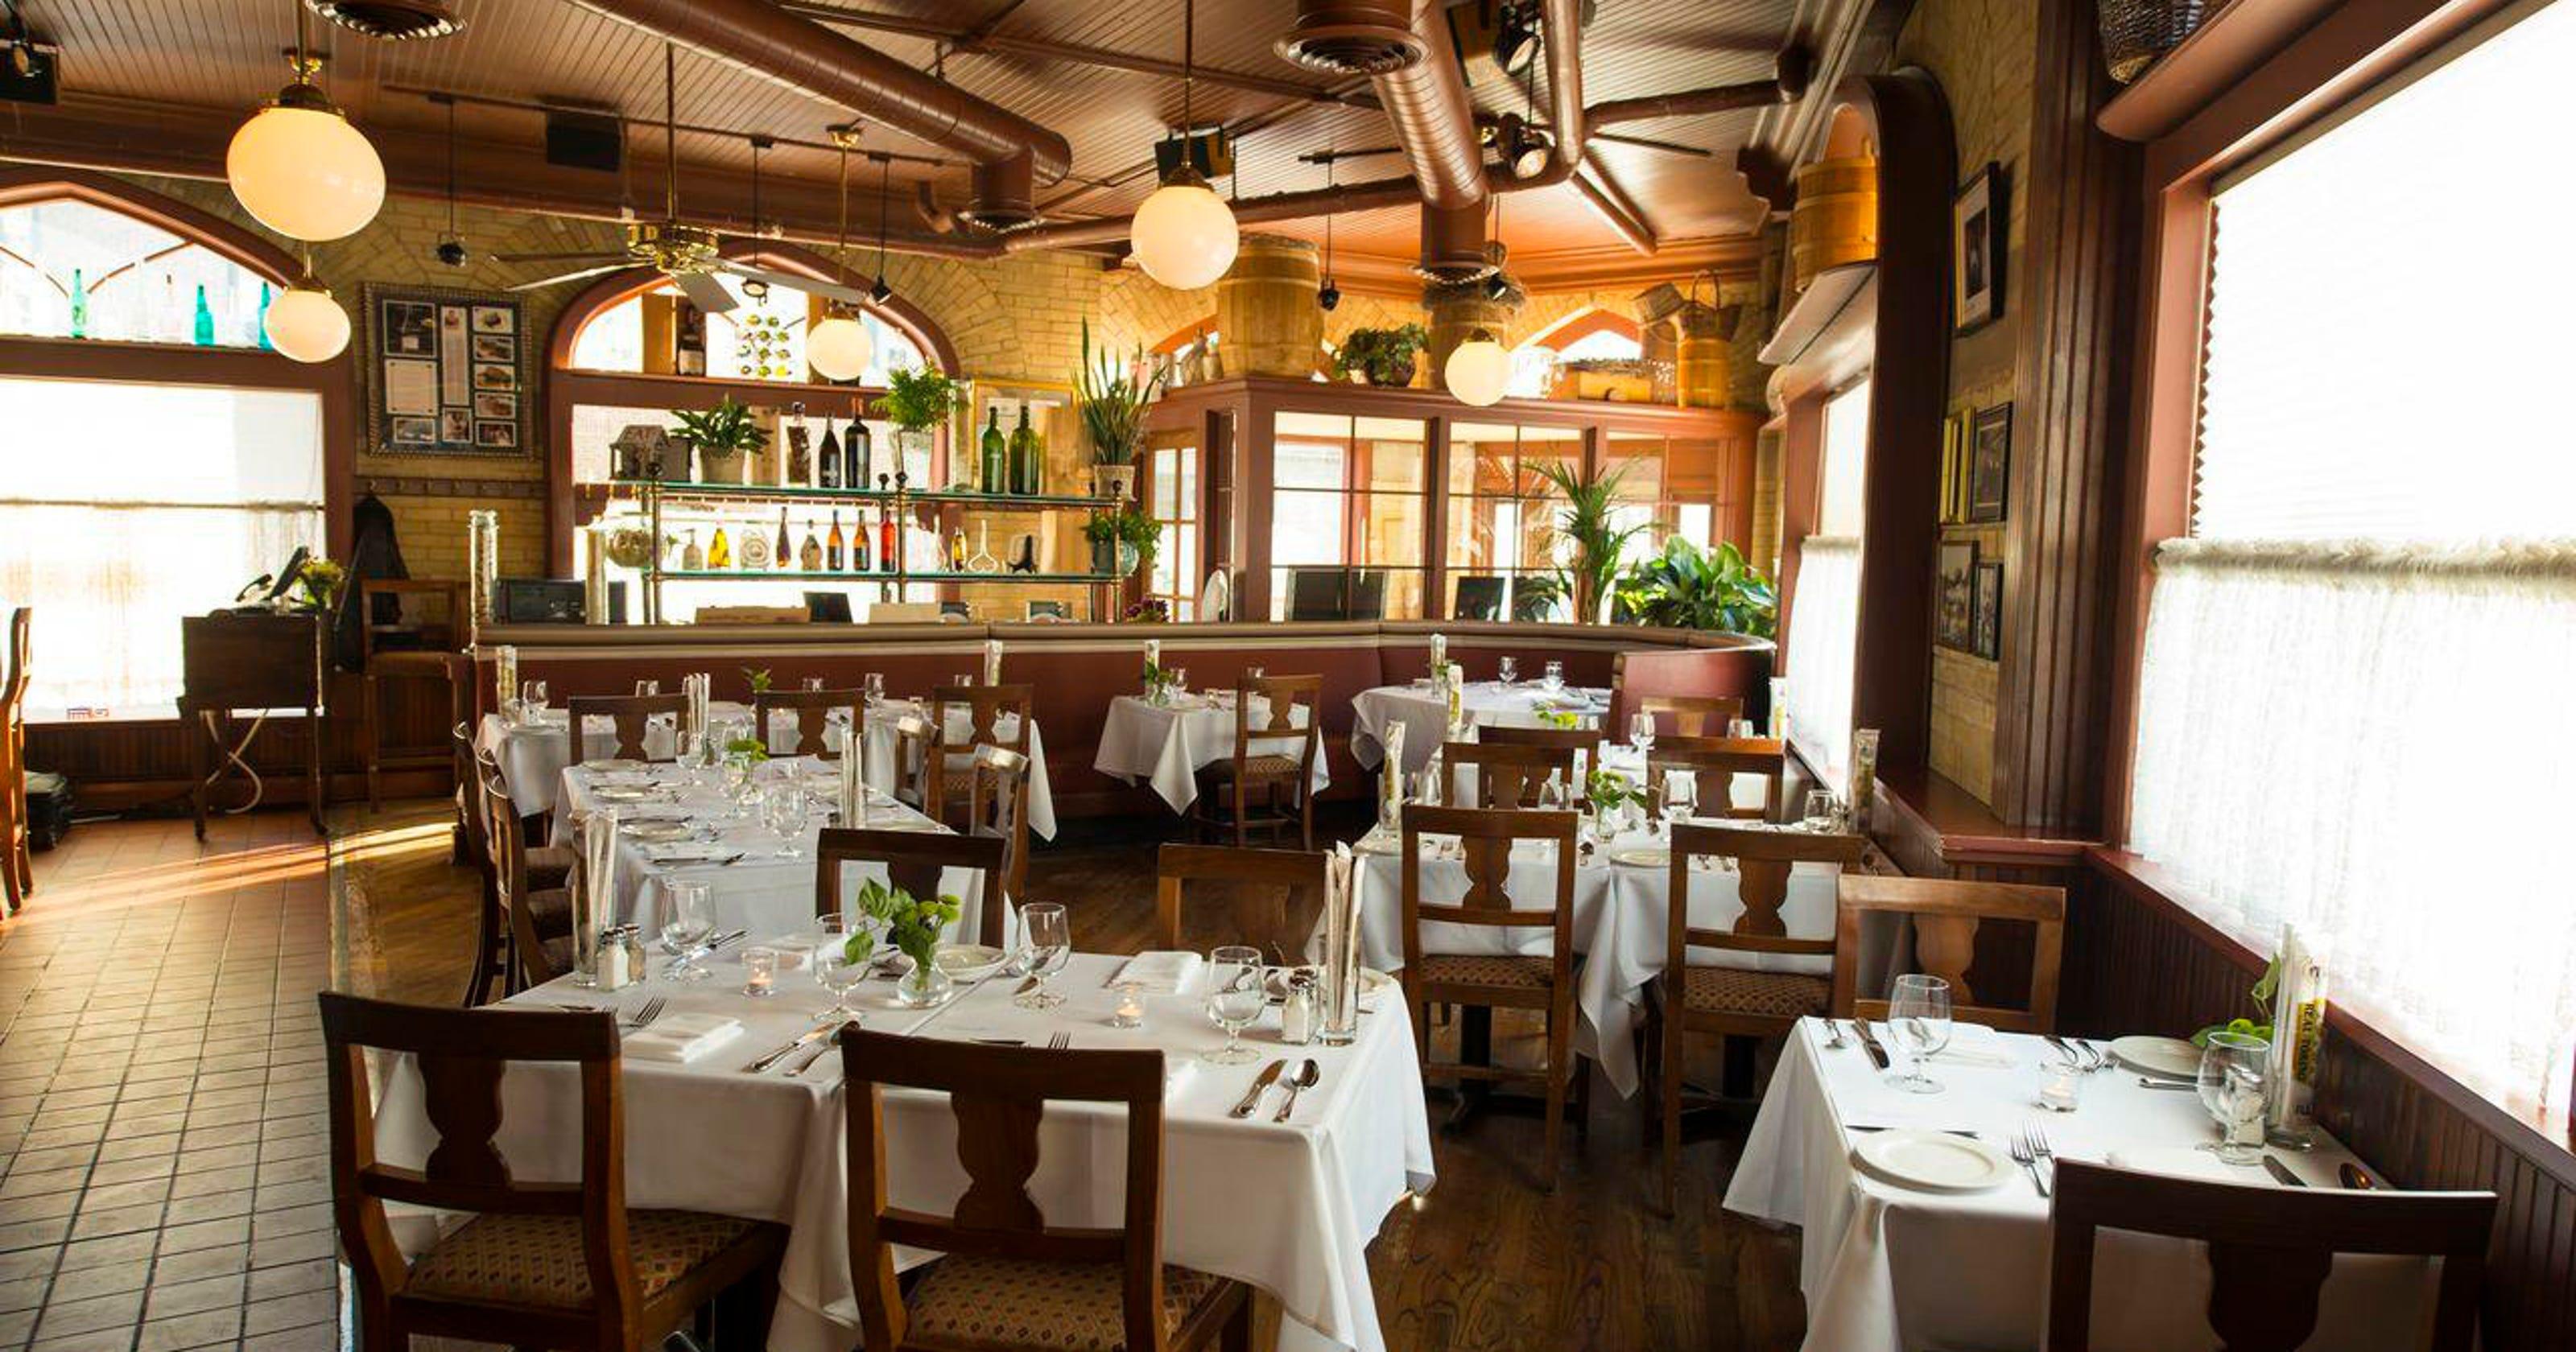 Timeline: The Bartolotta restaurant empire in Milwaukee